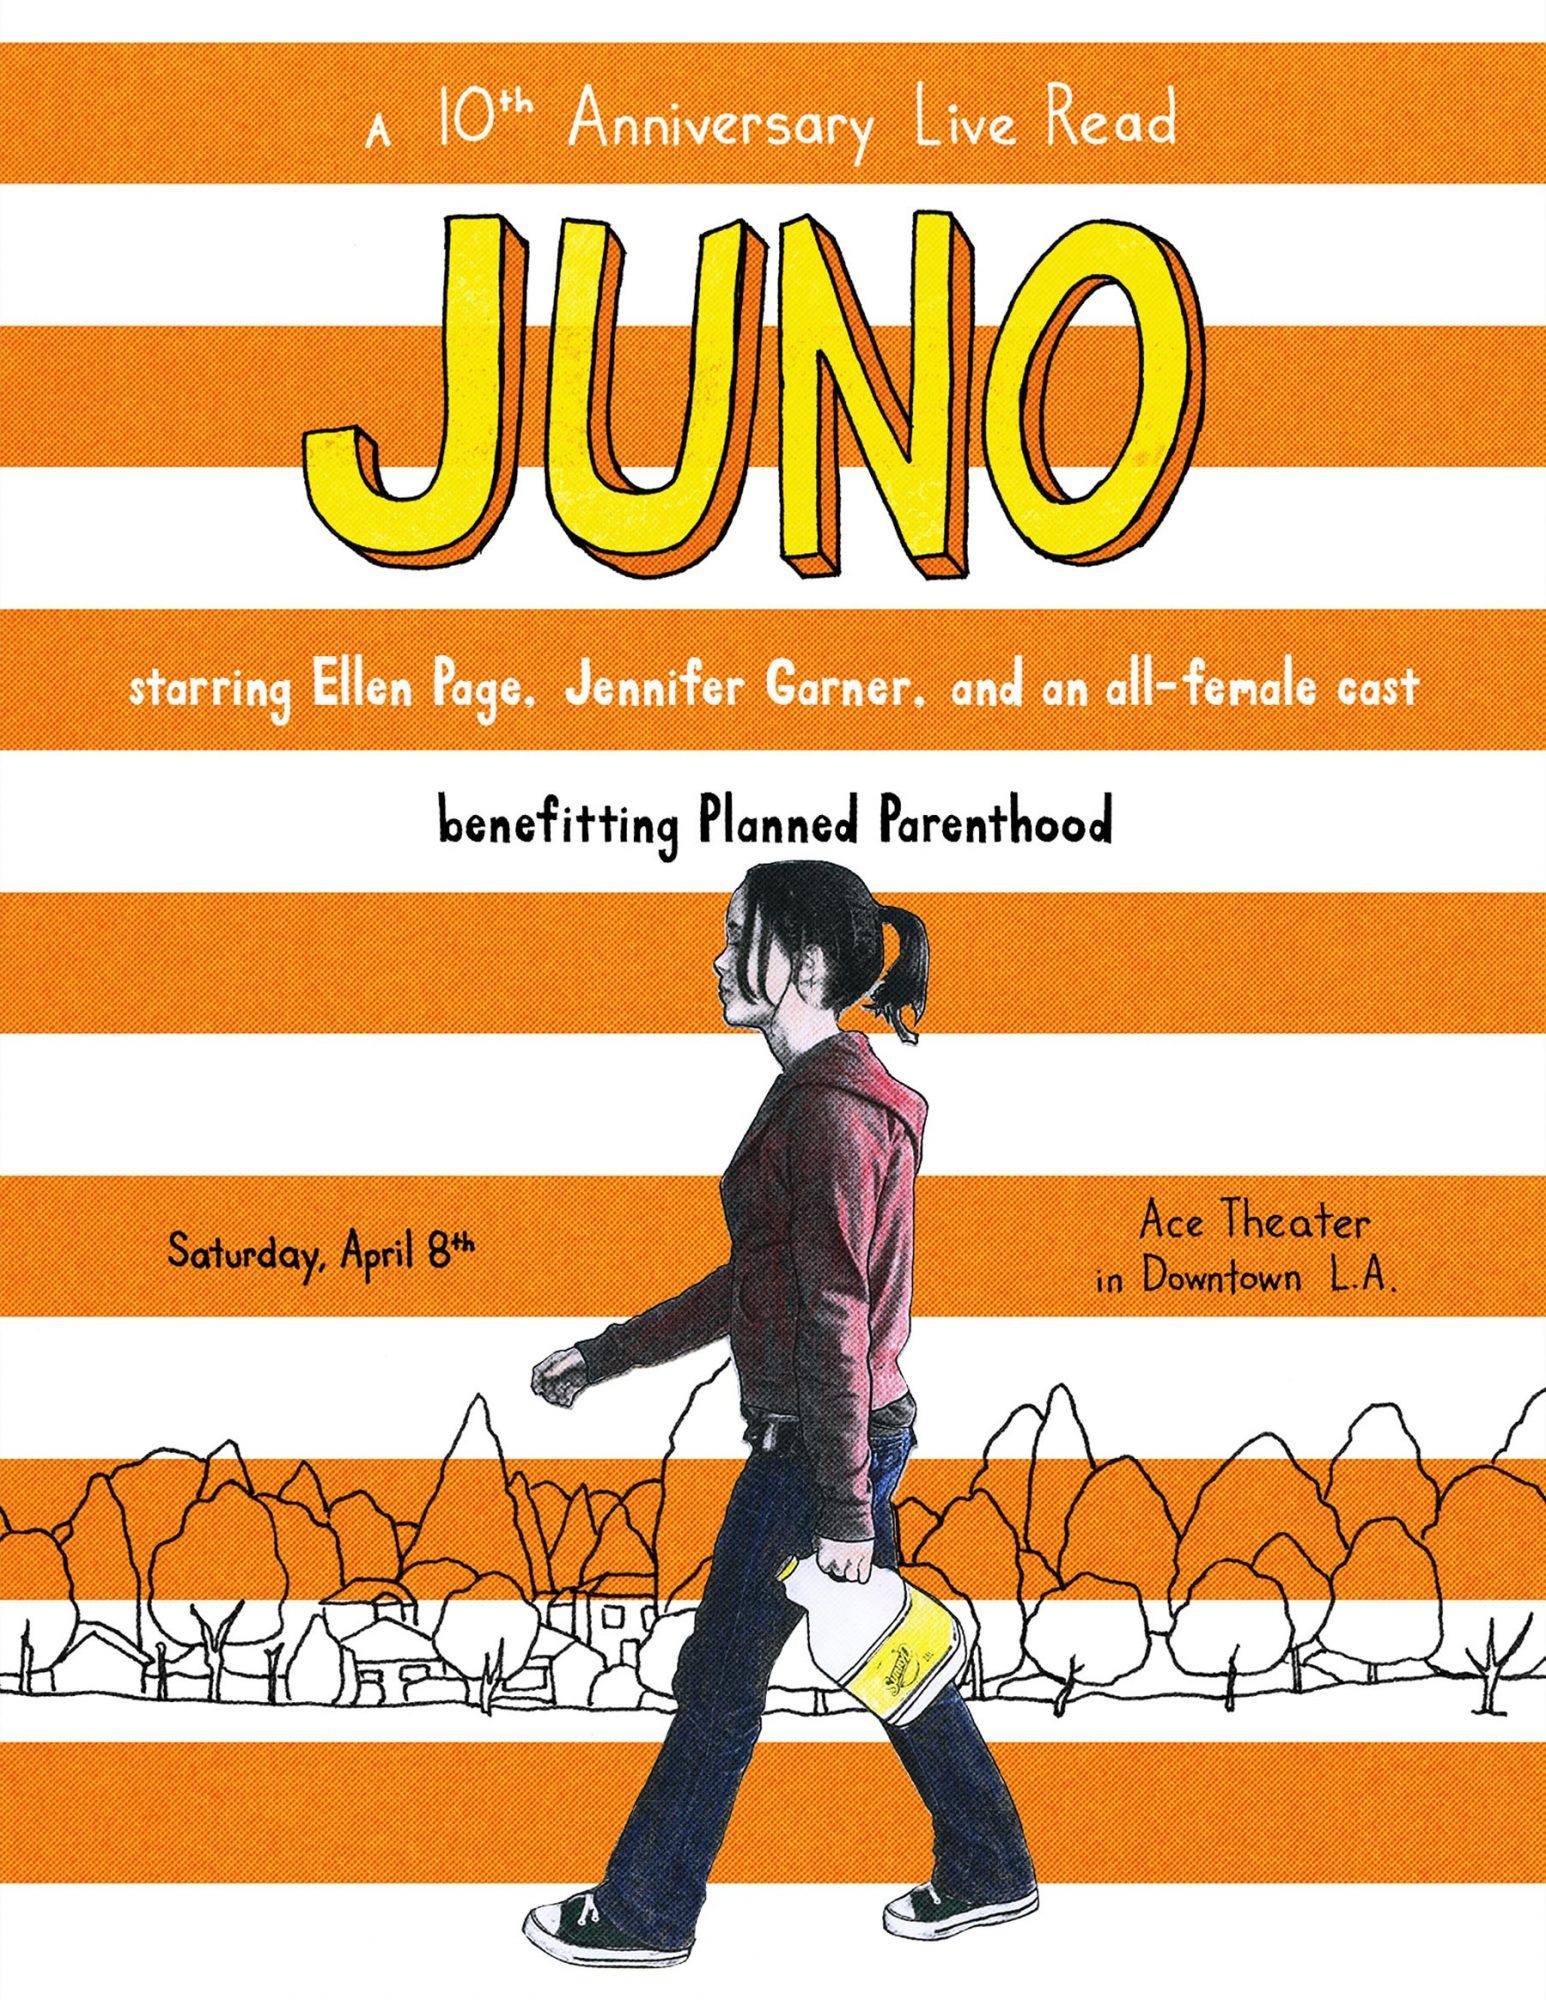 Juno Live Read poster